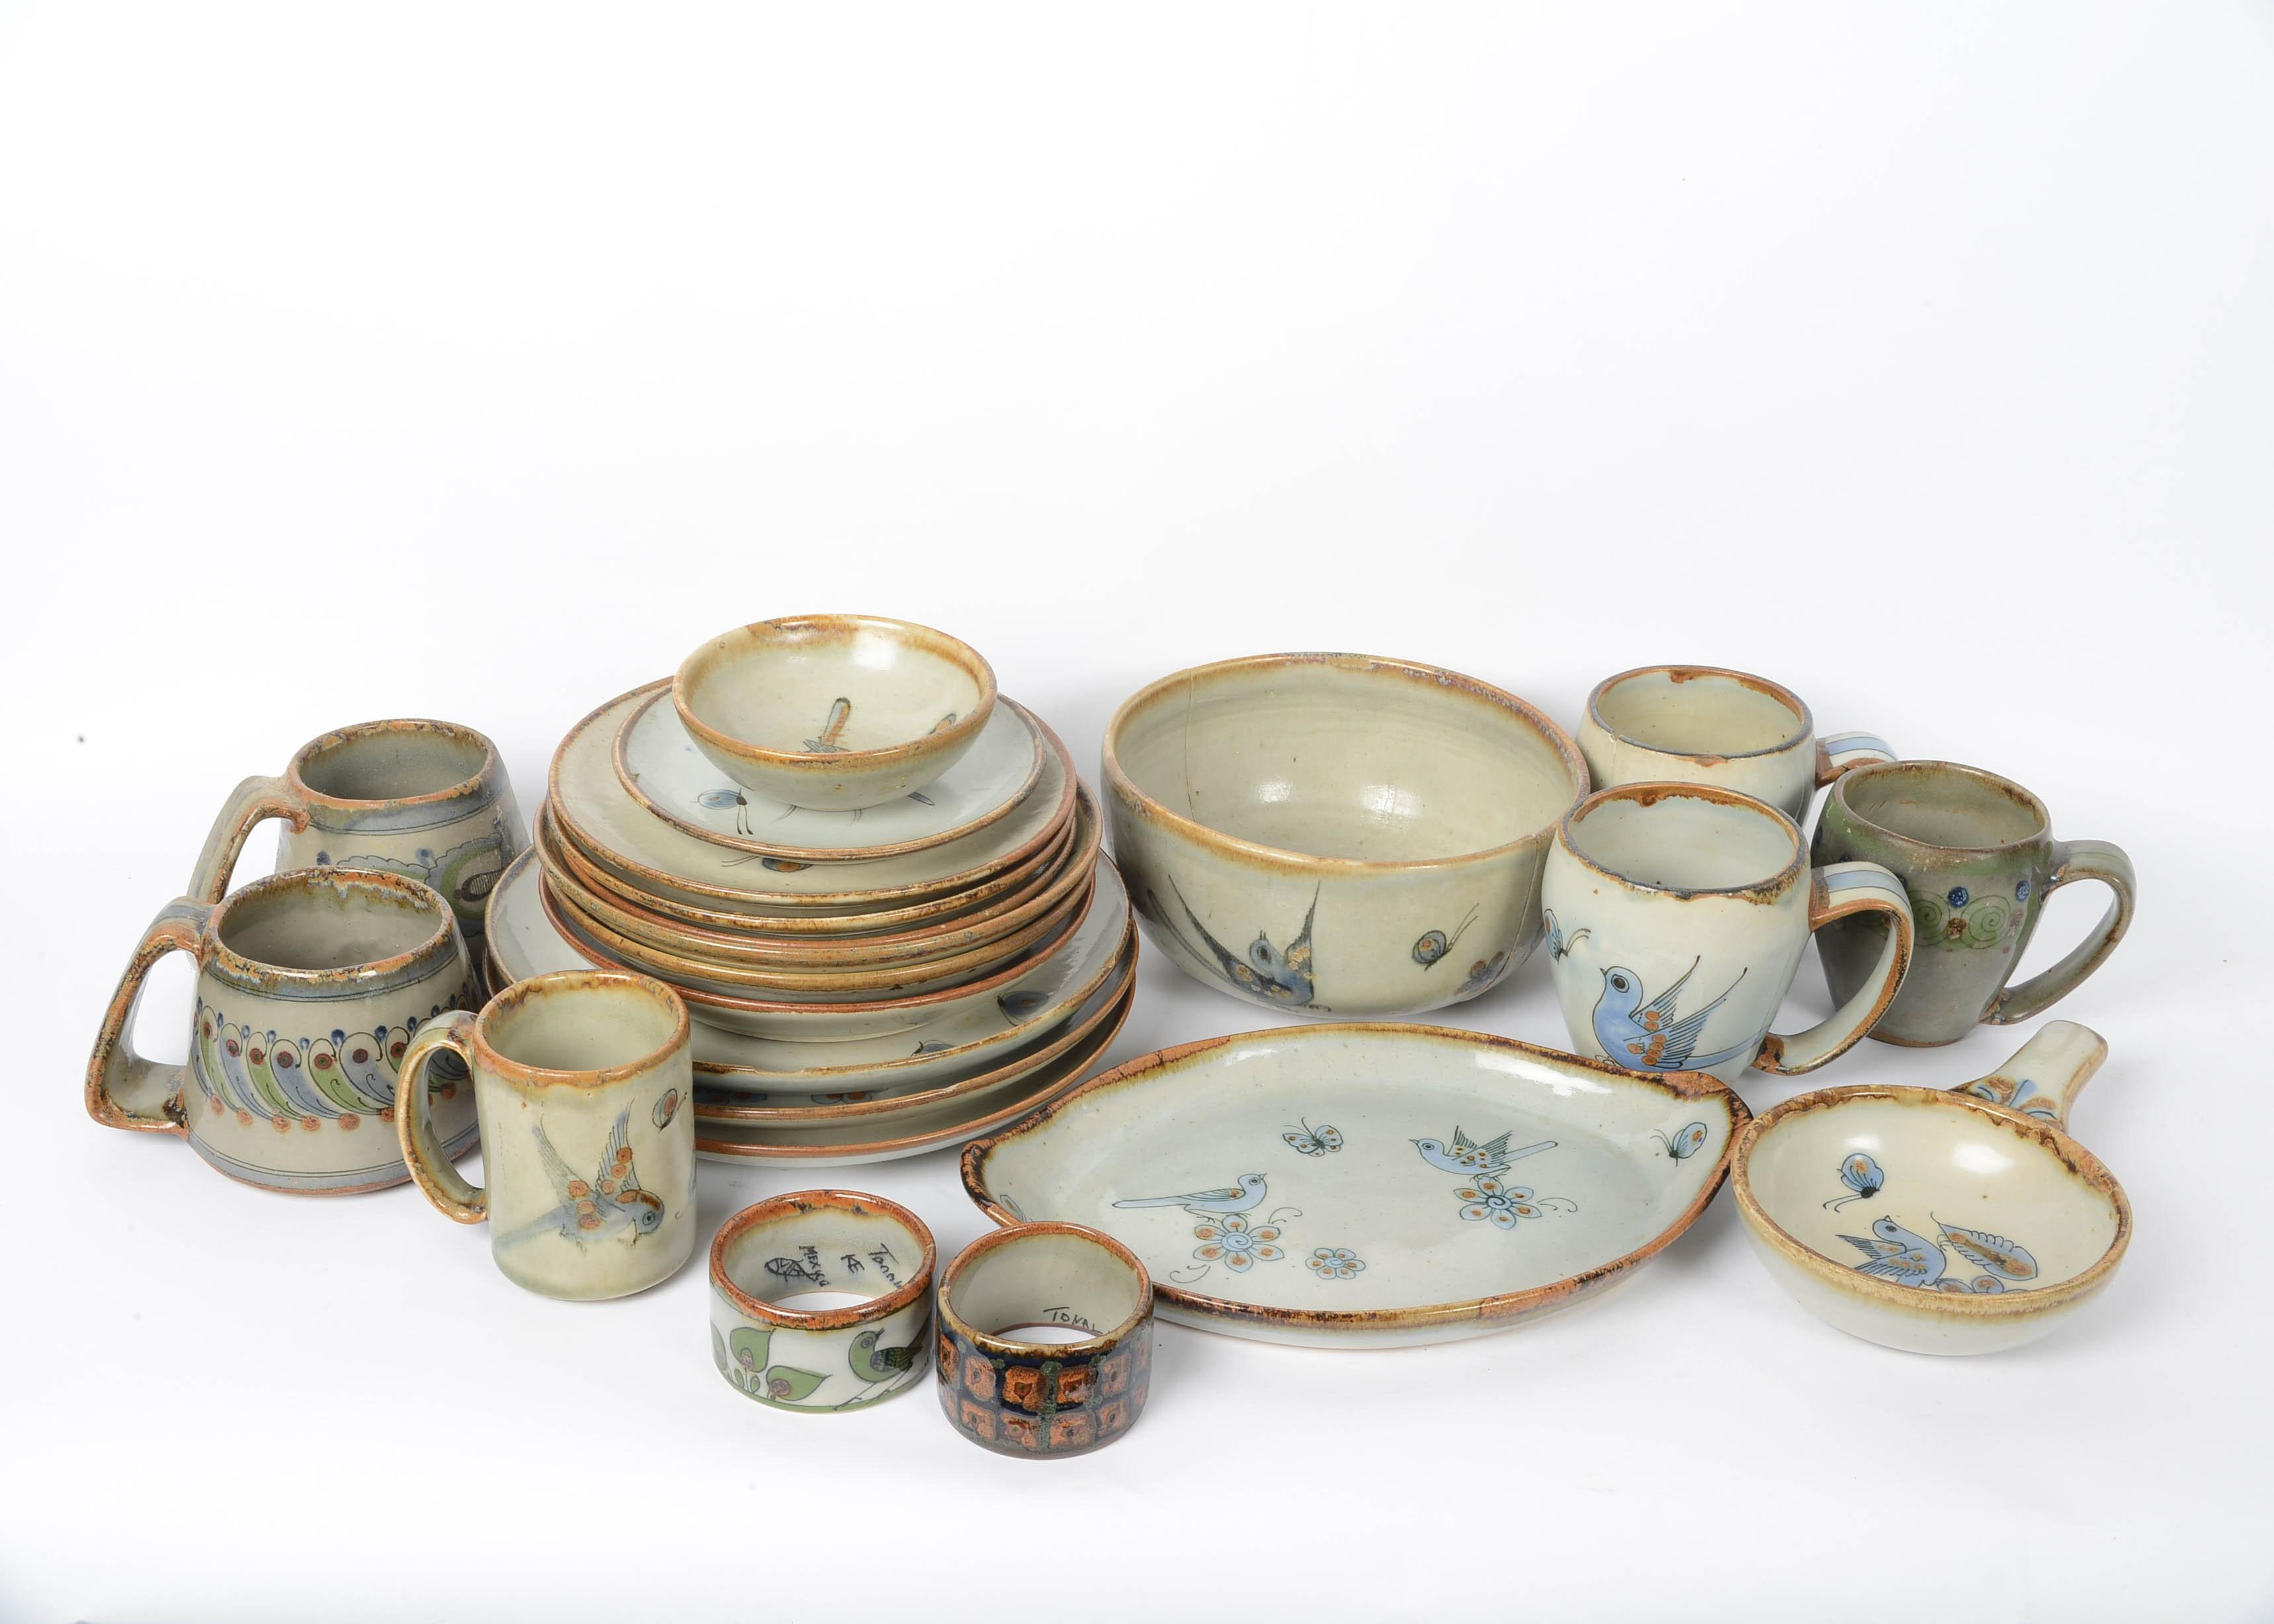 Ken Edwards El Palomar Handcrafted Mexican Pottery Dishware ...  sc 1 st  EBTH.com & Ken Edwards El Palomar Handcrafted Mexican Pottery Dishware : EBTH